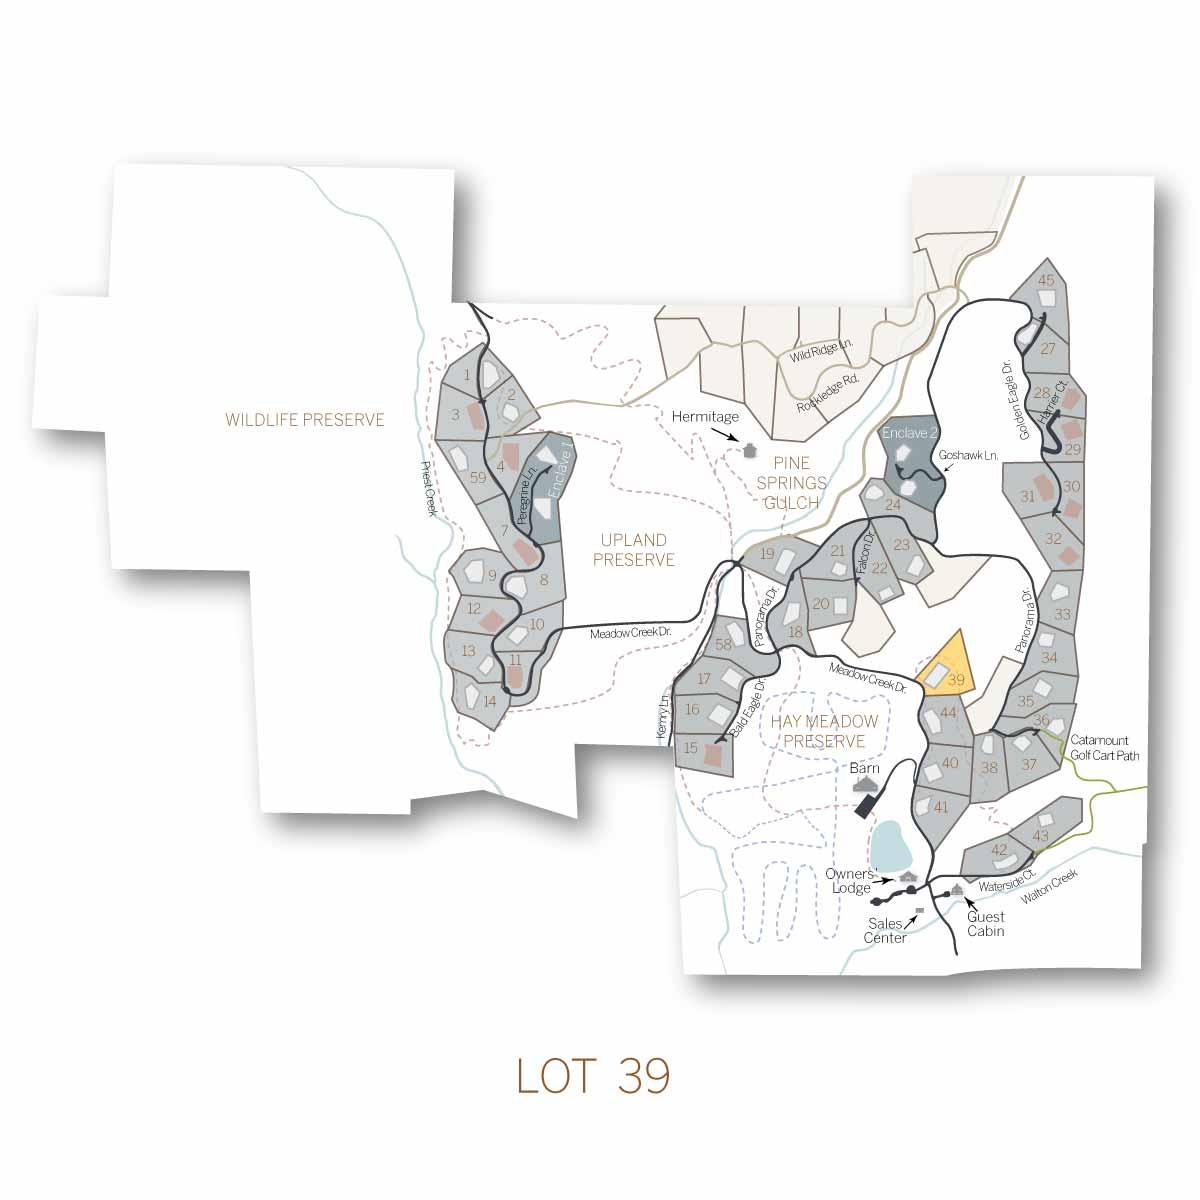 lot 39 1 - Homesite #39